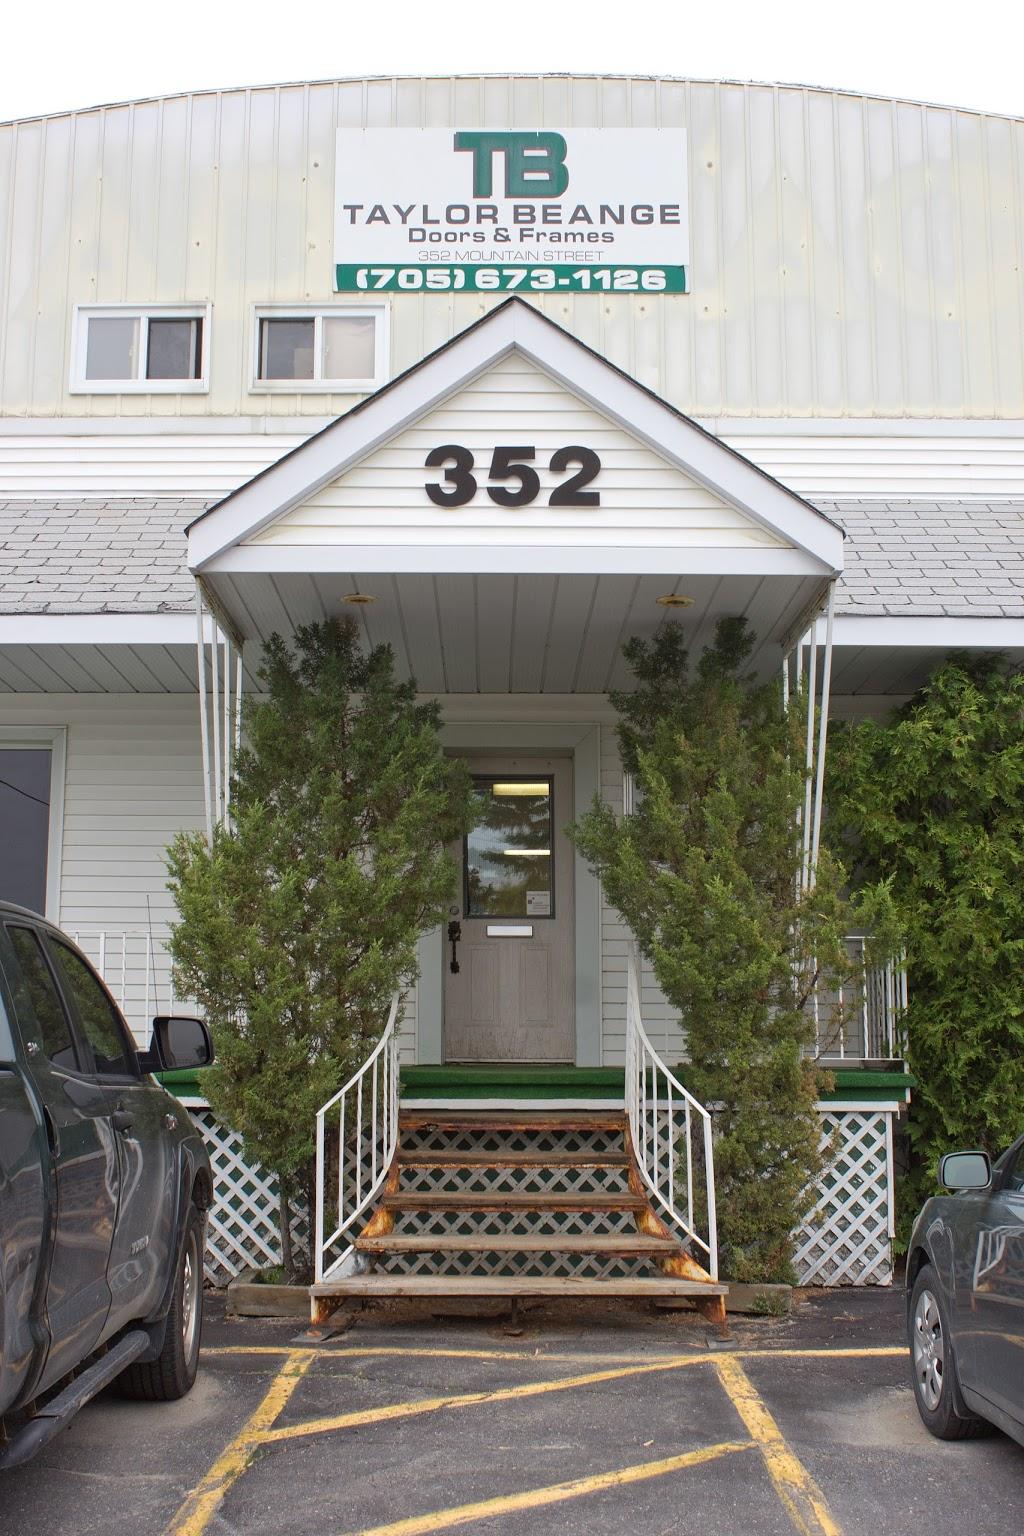 TB Doors & Frames | hardware store | 352 Mountain St, Sudbury, ON P3B 2T7, Canada | 7056731126 OR +1 705-673-1126